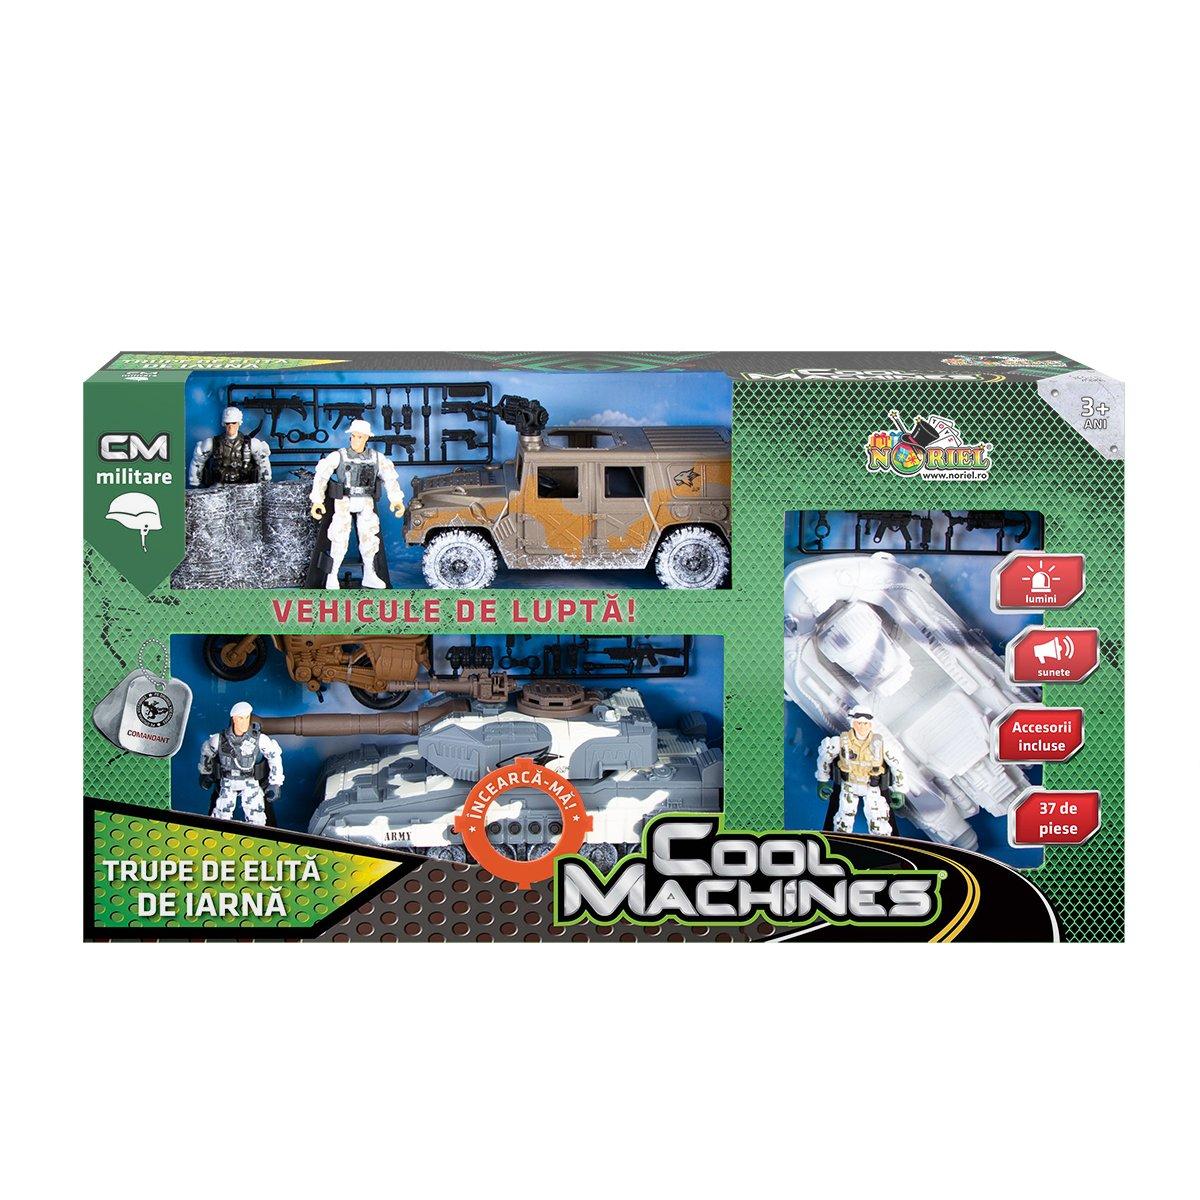 Set militar cu vehicule de iarna Cool Machines, Trupe de elita